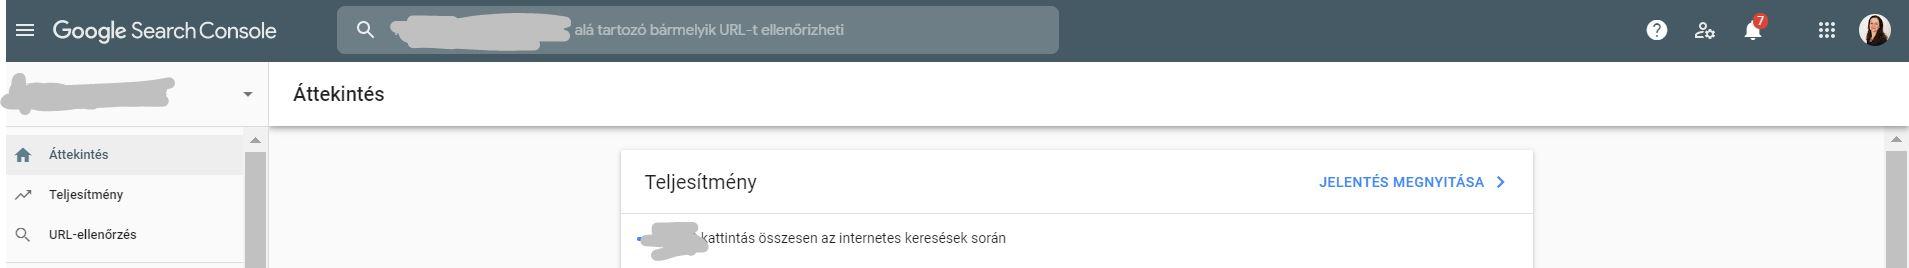 google-search-console-bejelentkezve